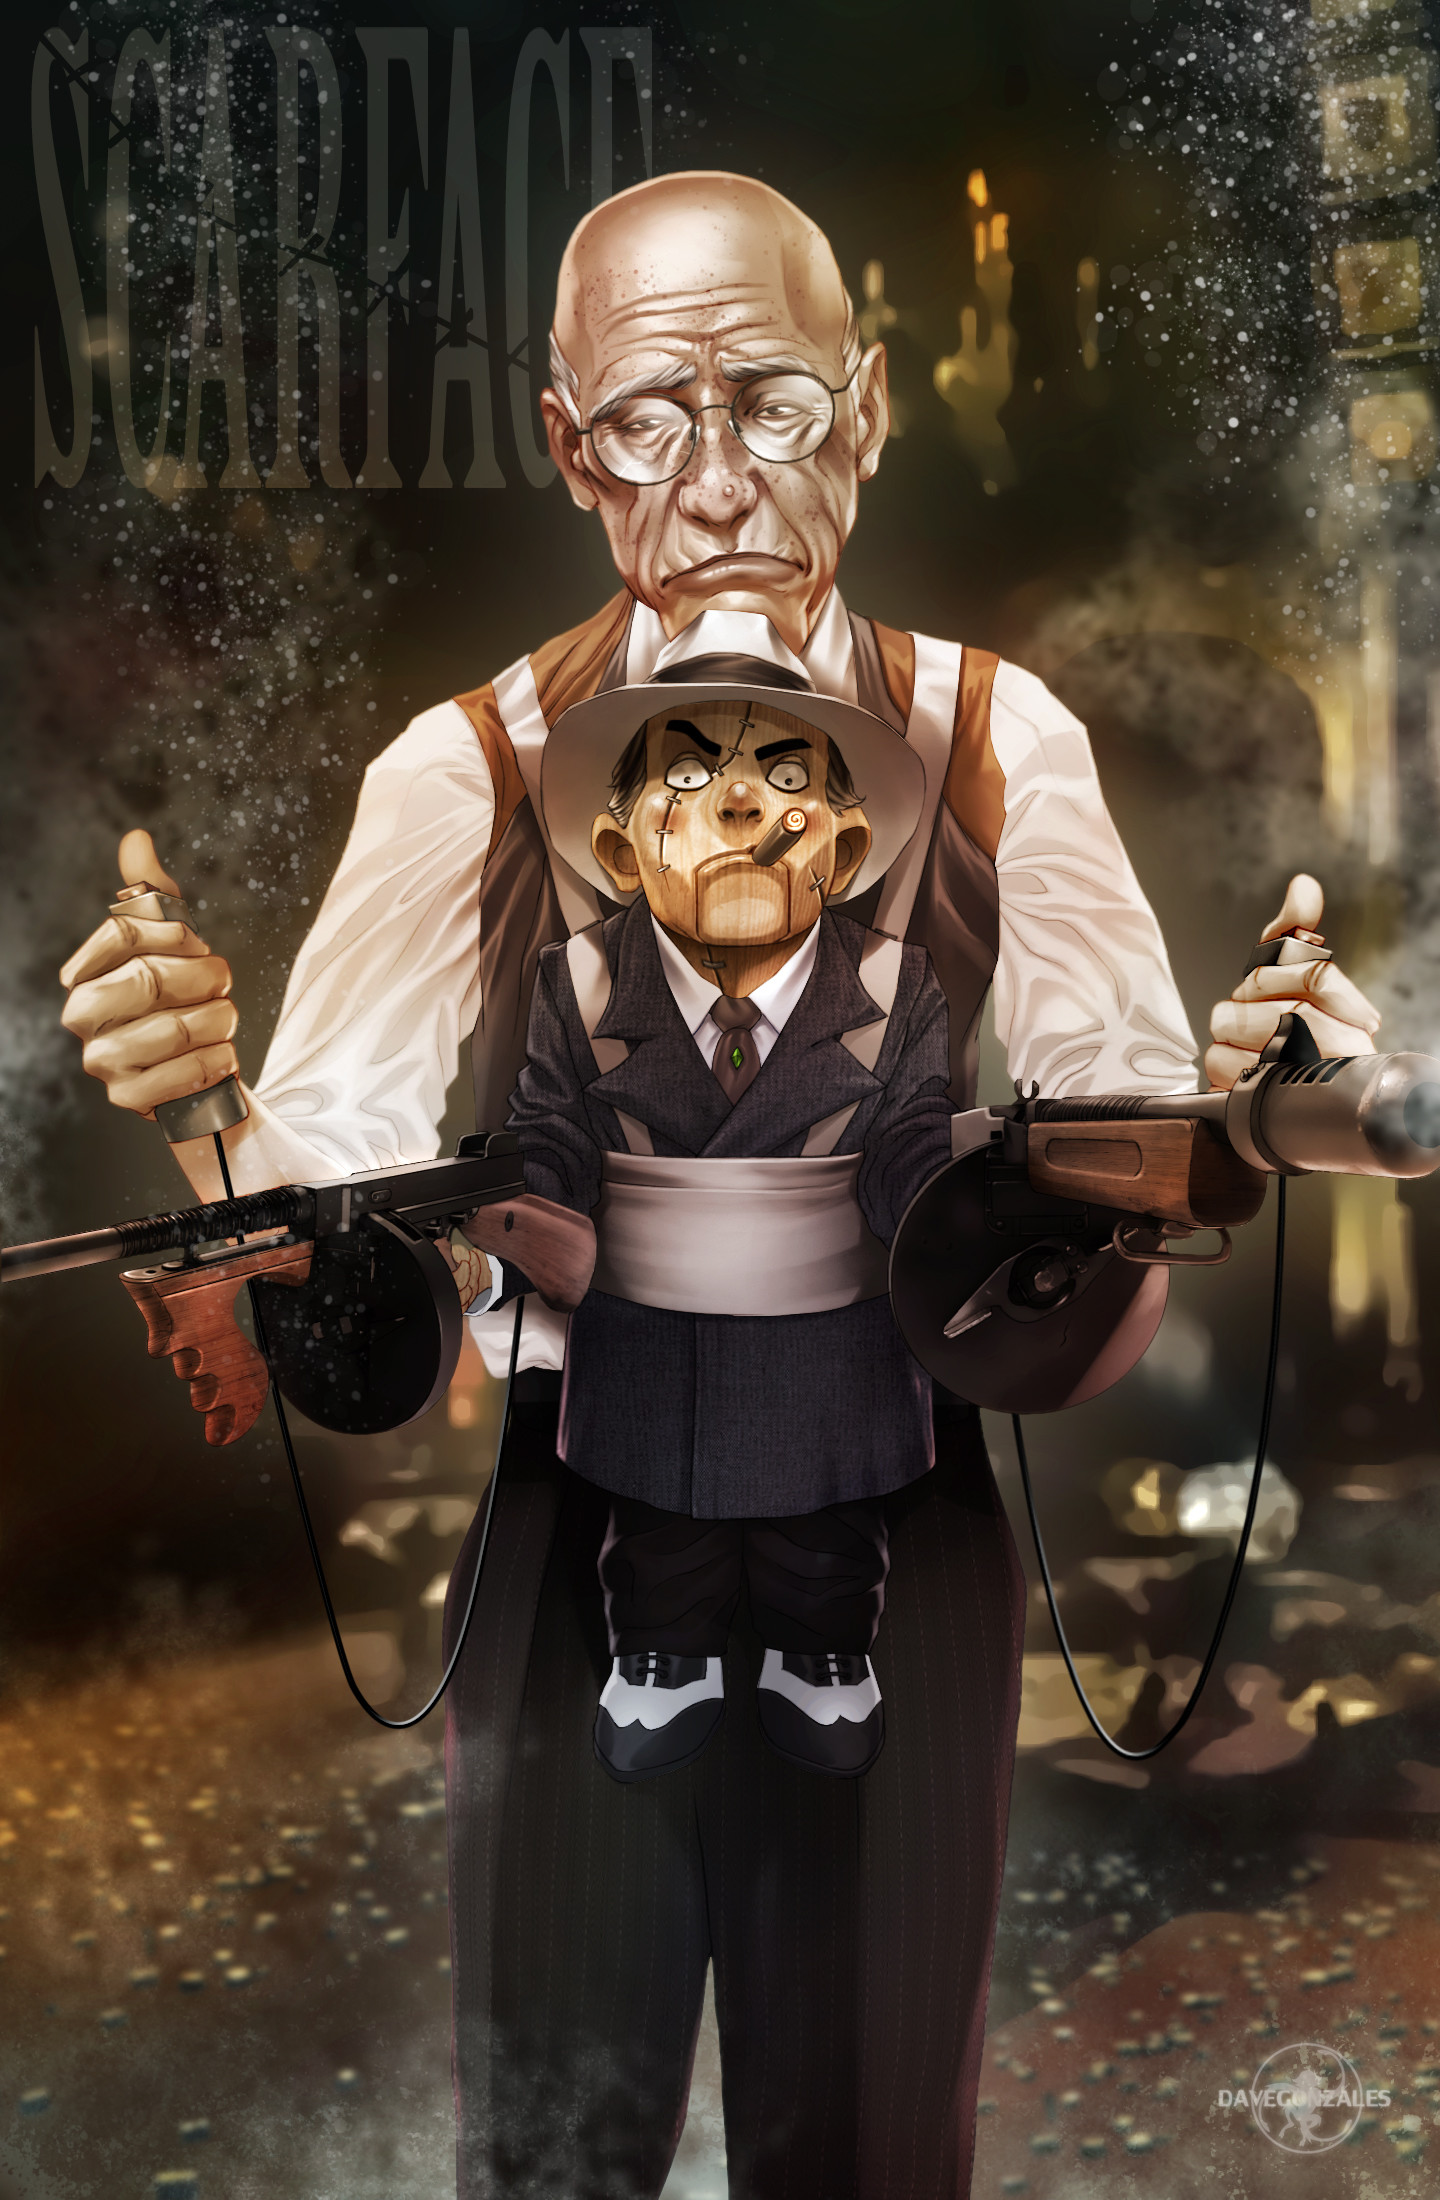 ArtStation - The Ventriloquist, Christian Dave Gonzales